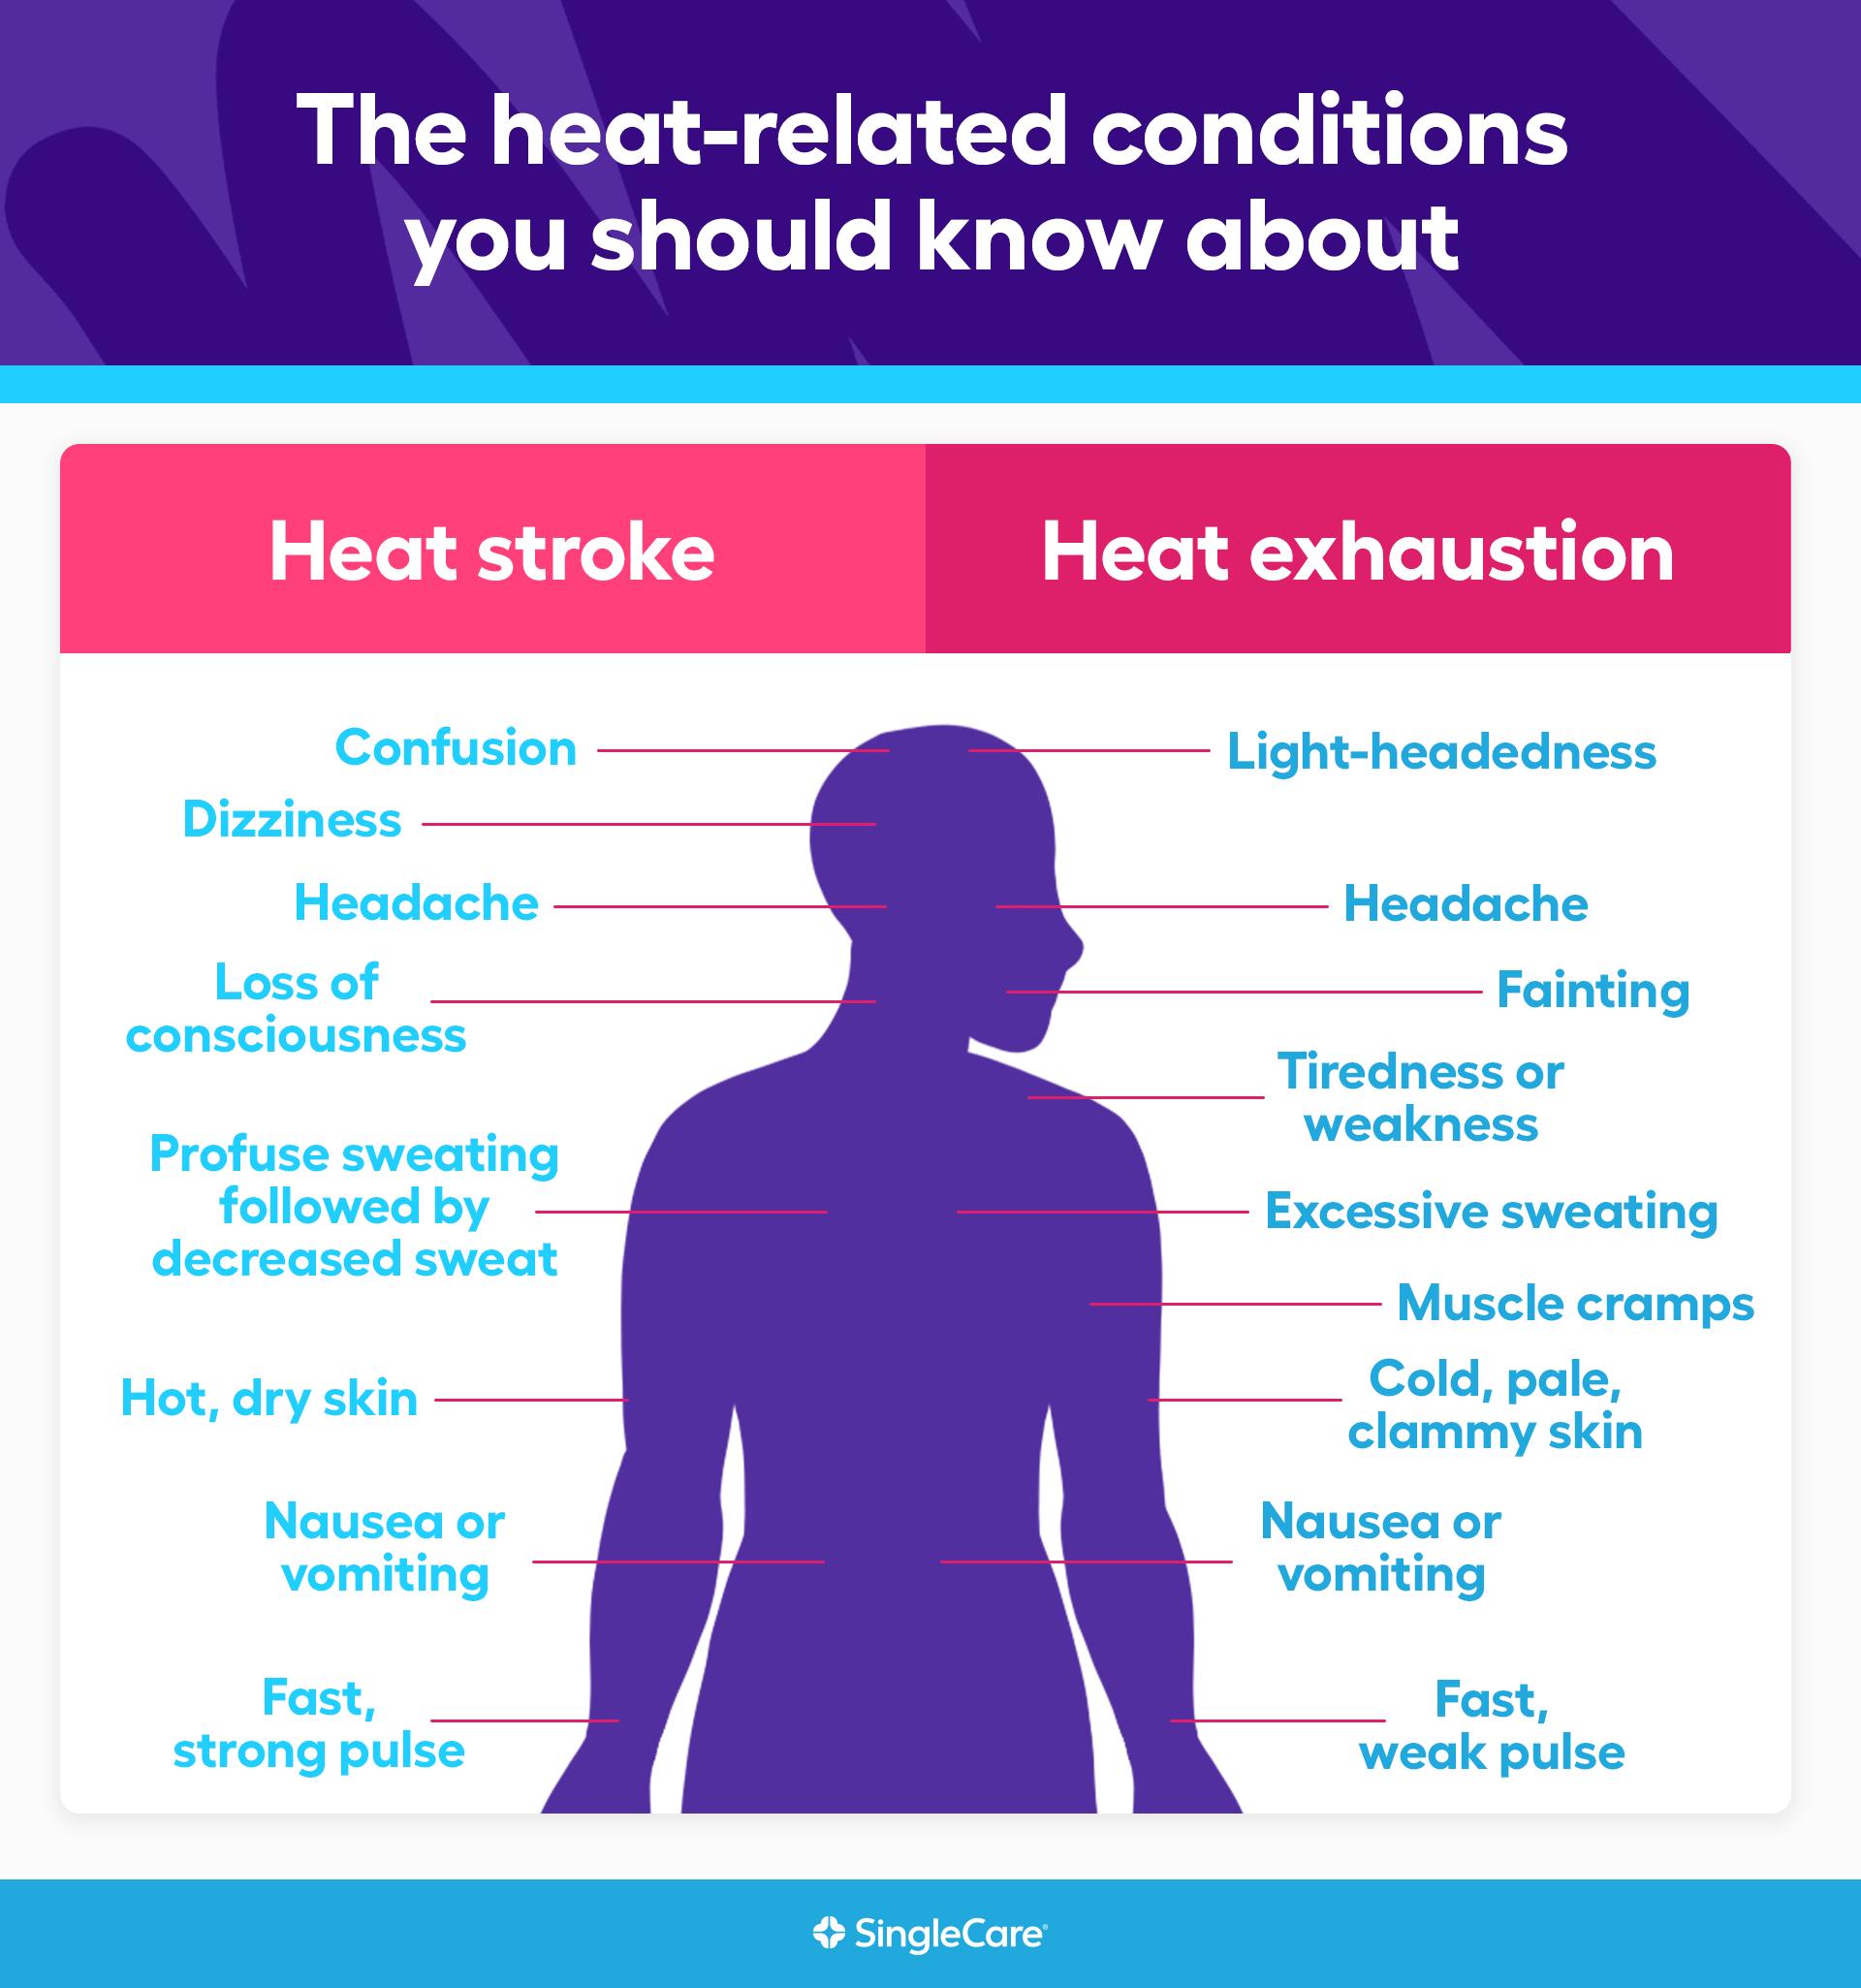 An infographic of heat illness